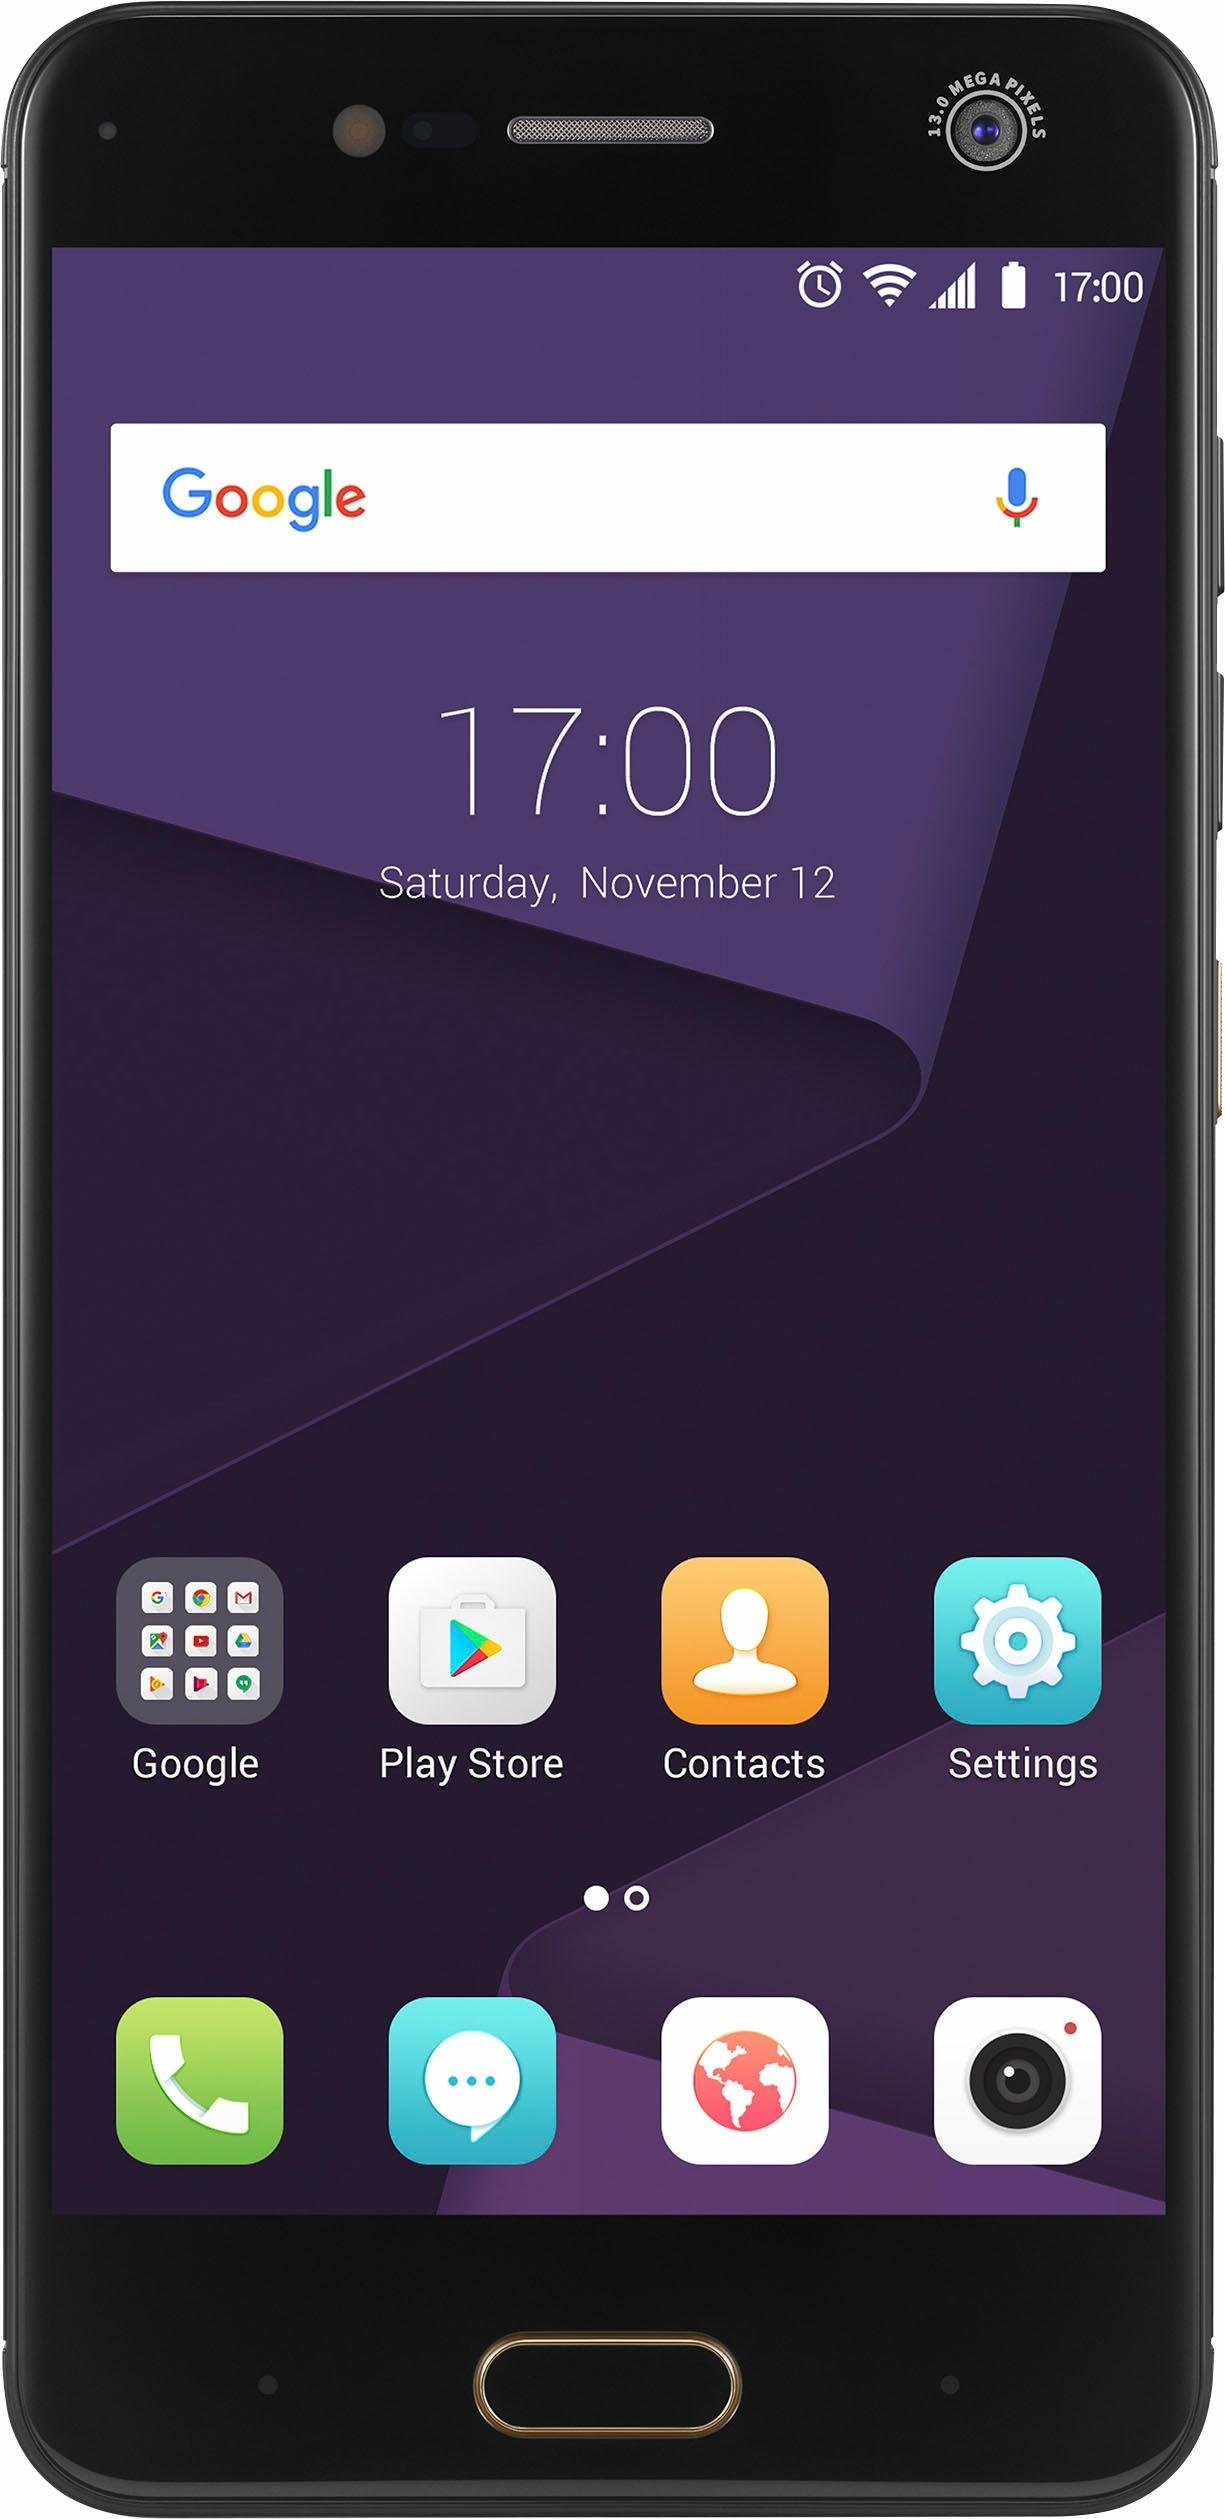 Zte Blade V8-64 GB smartphone (13,2 cm / 5,2 inch, 64 GB, 13 MP camera) online kopen op otto.nl